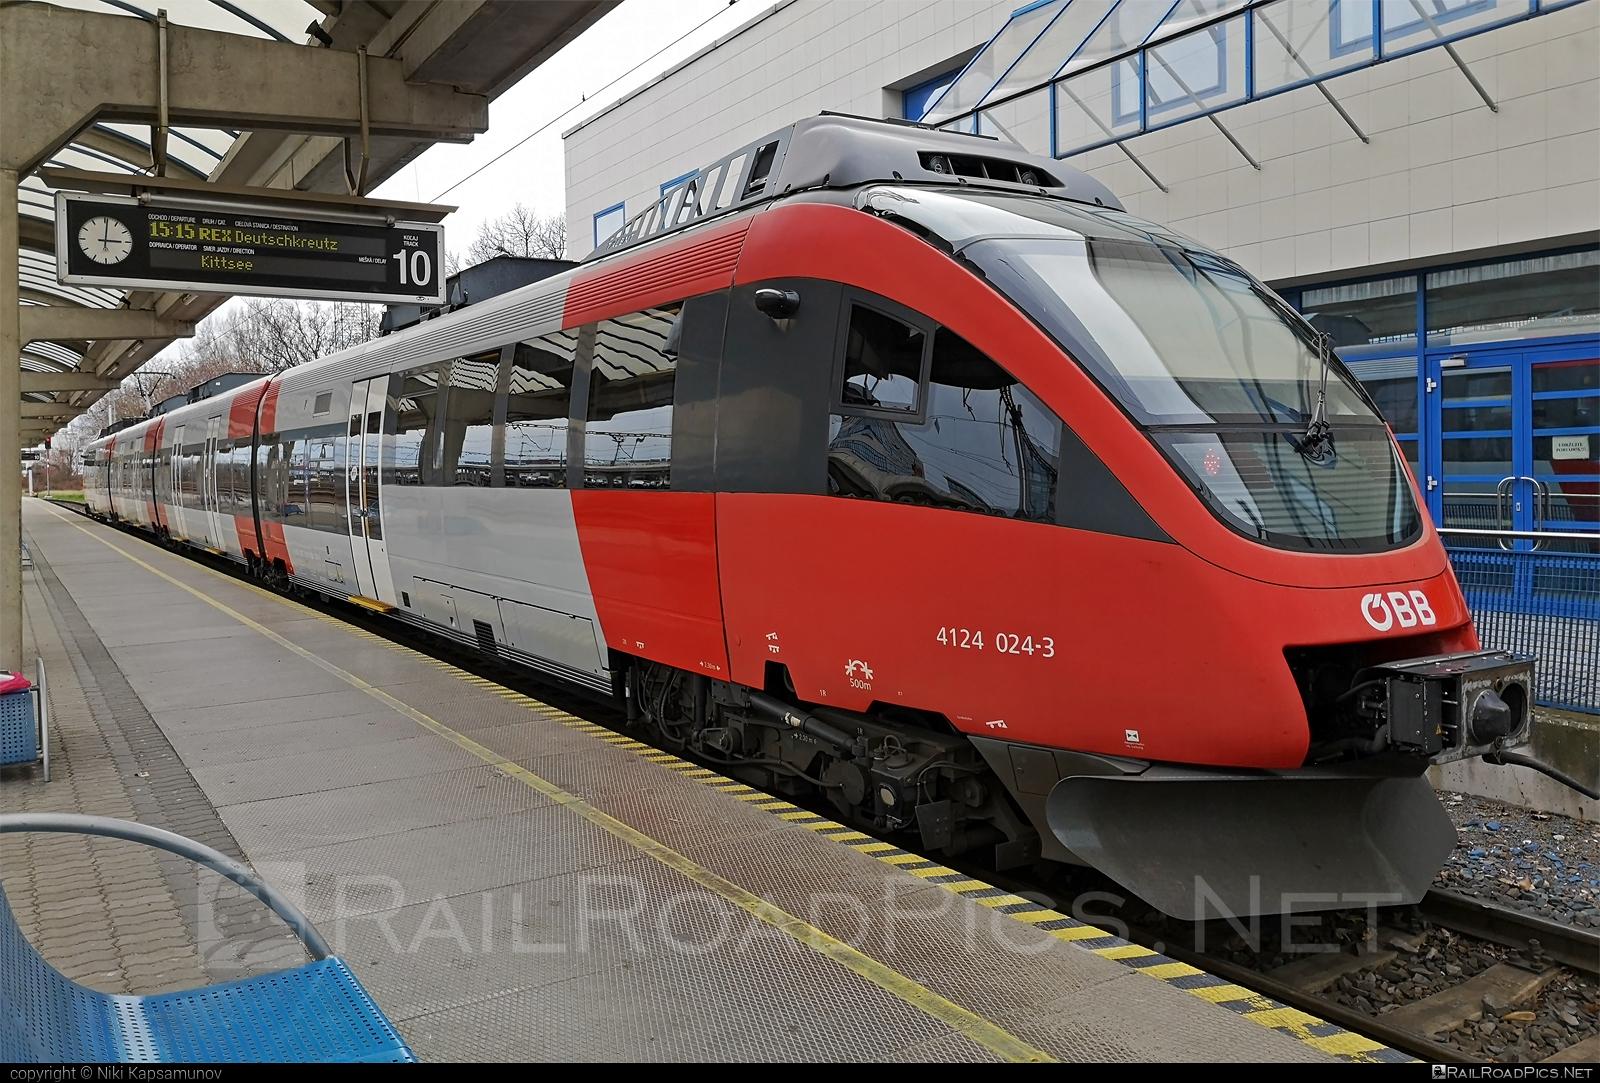 Bombardier Talent - 4124 024-3 operated by Österreichische Bundesbahnen #bombardier #bombardiertalent #obb #osterreichischebundesbahnen